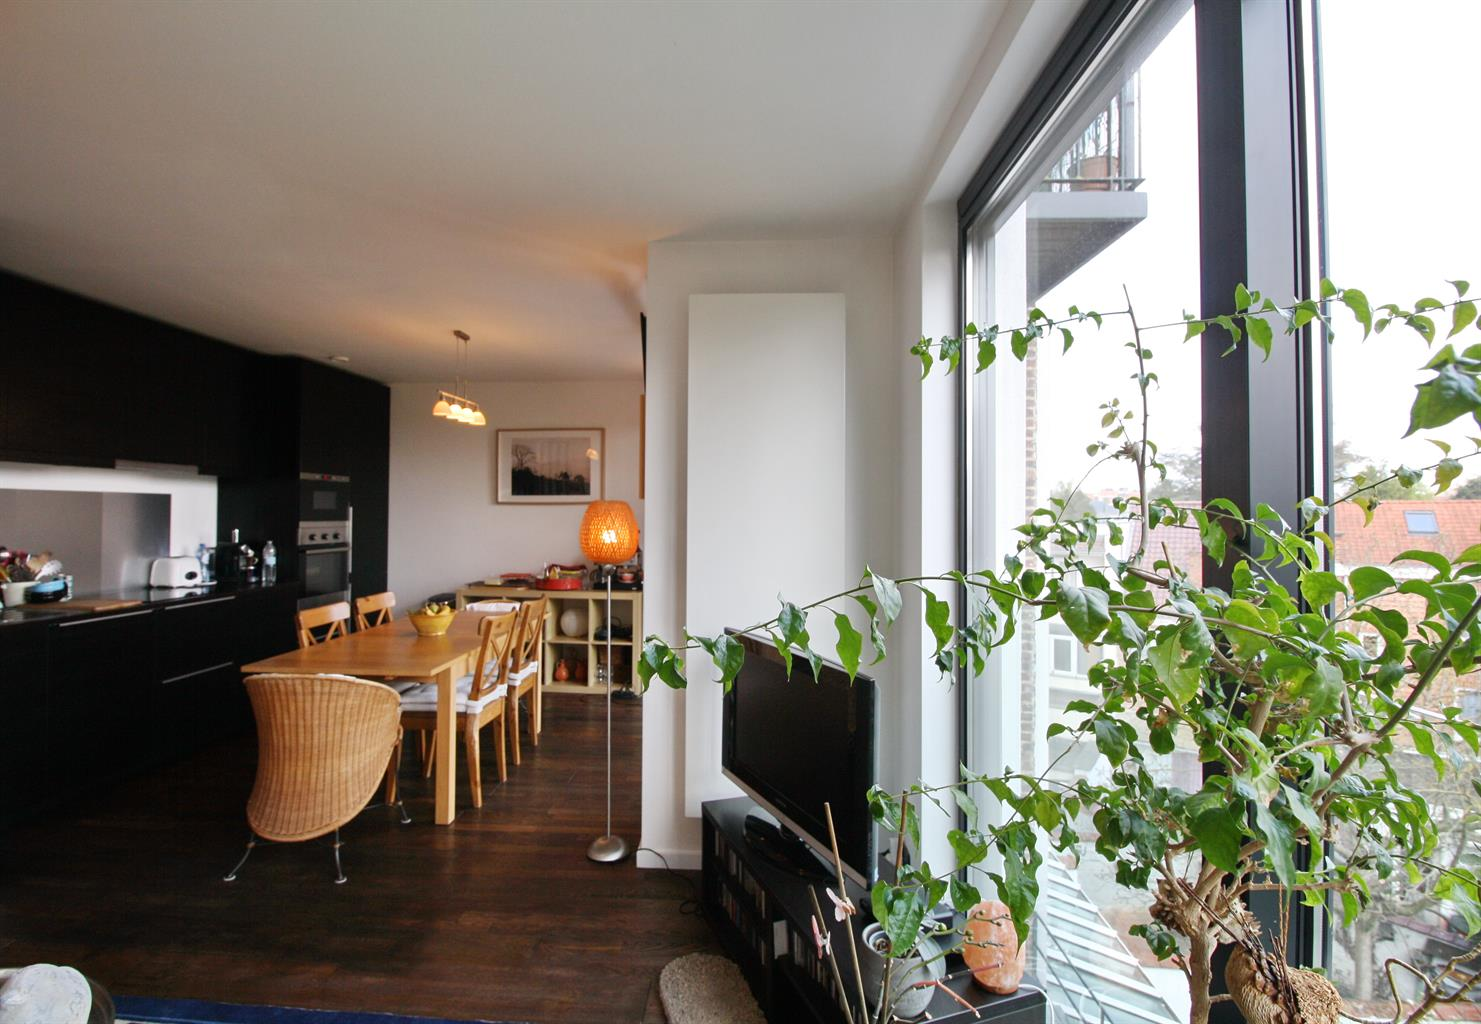 Penthouse - Berchem-Sainte-Agathe - #4346071-7